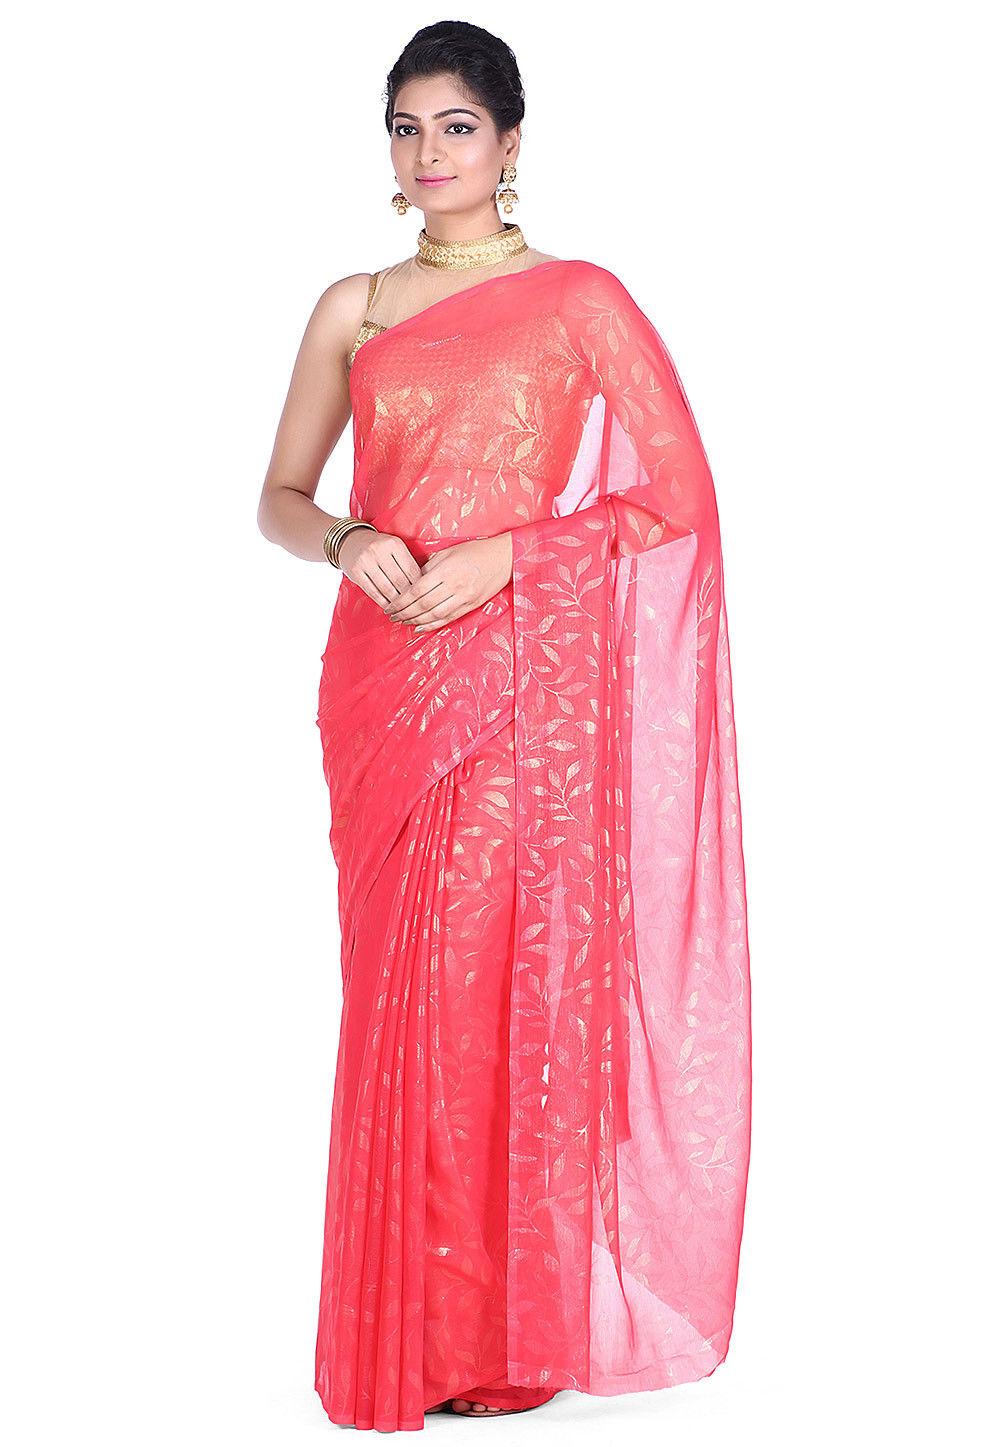 Printed Chiffon Saree in Old Rose